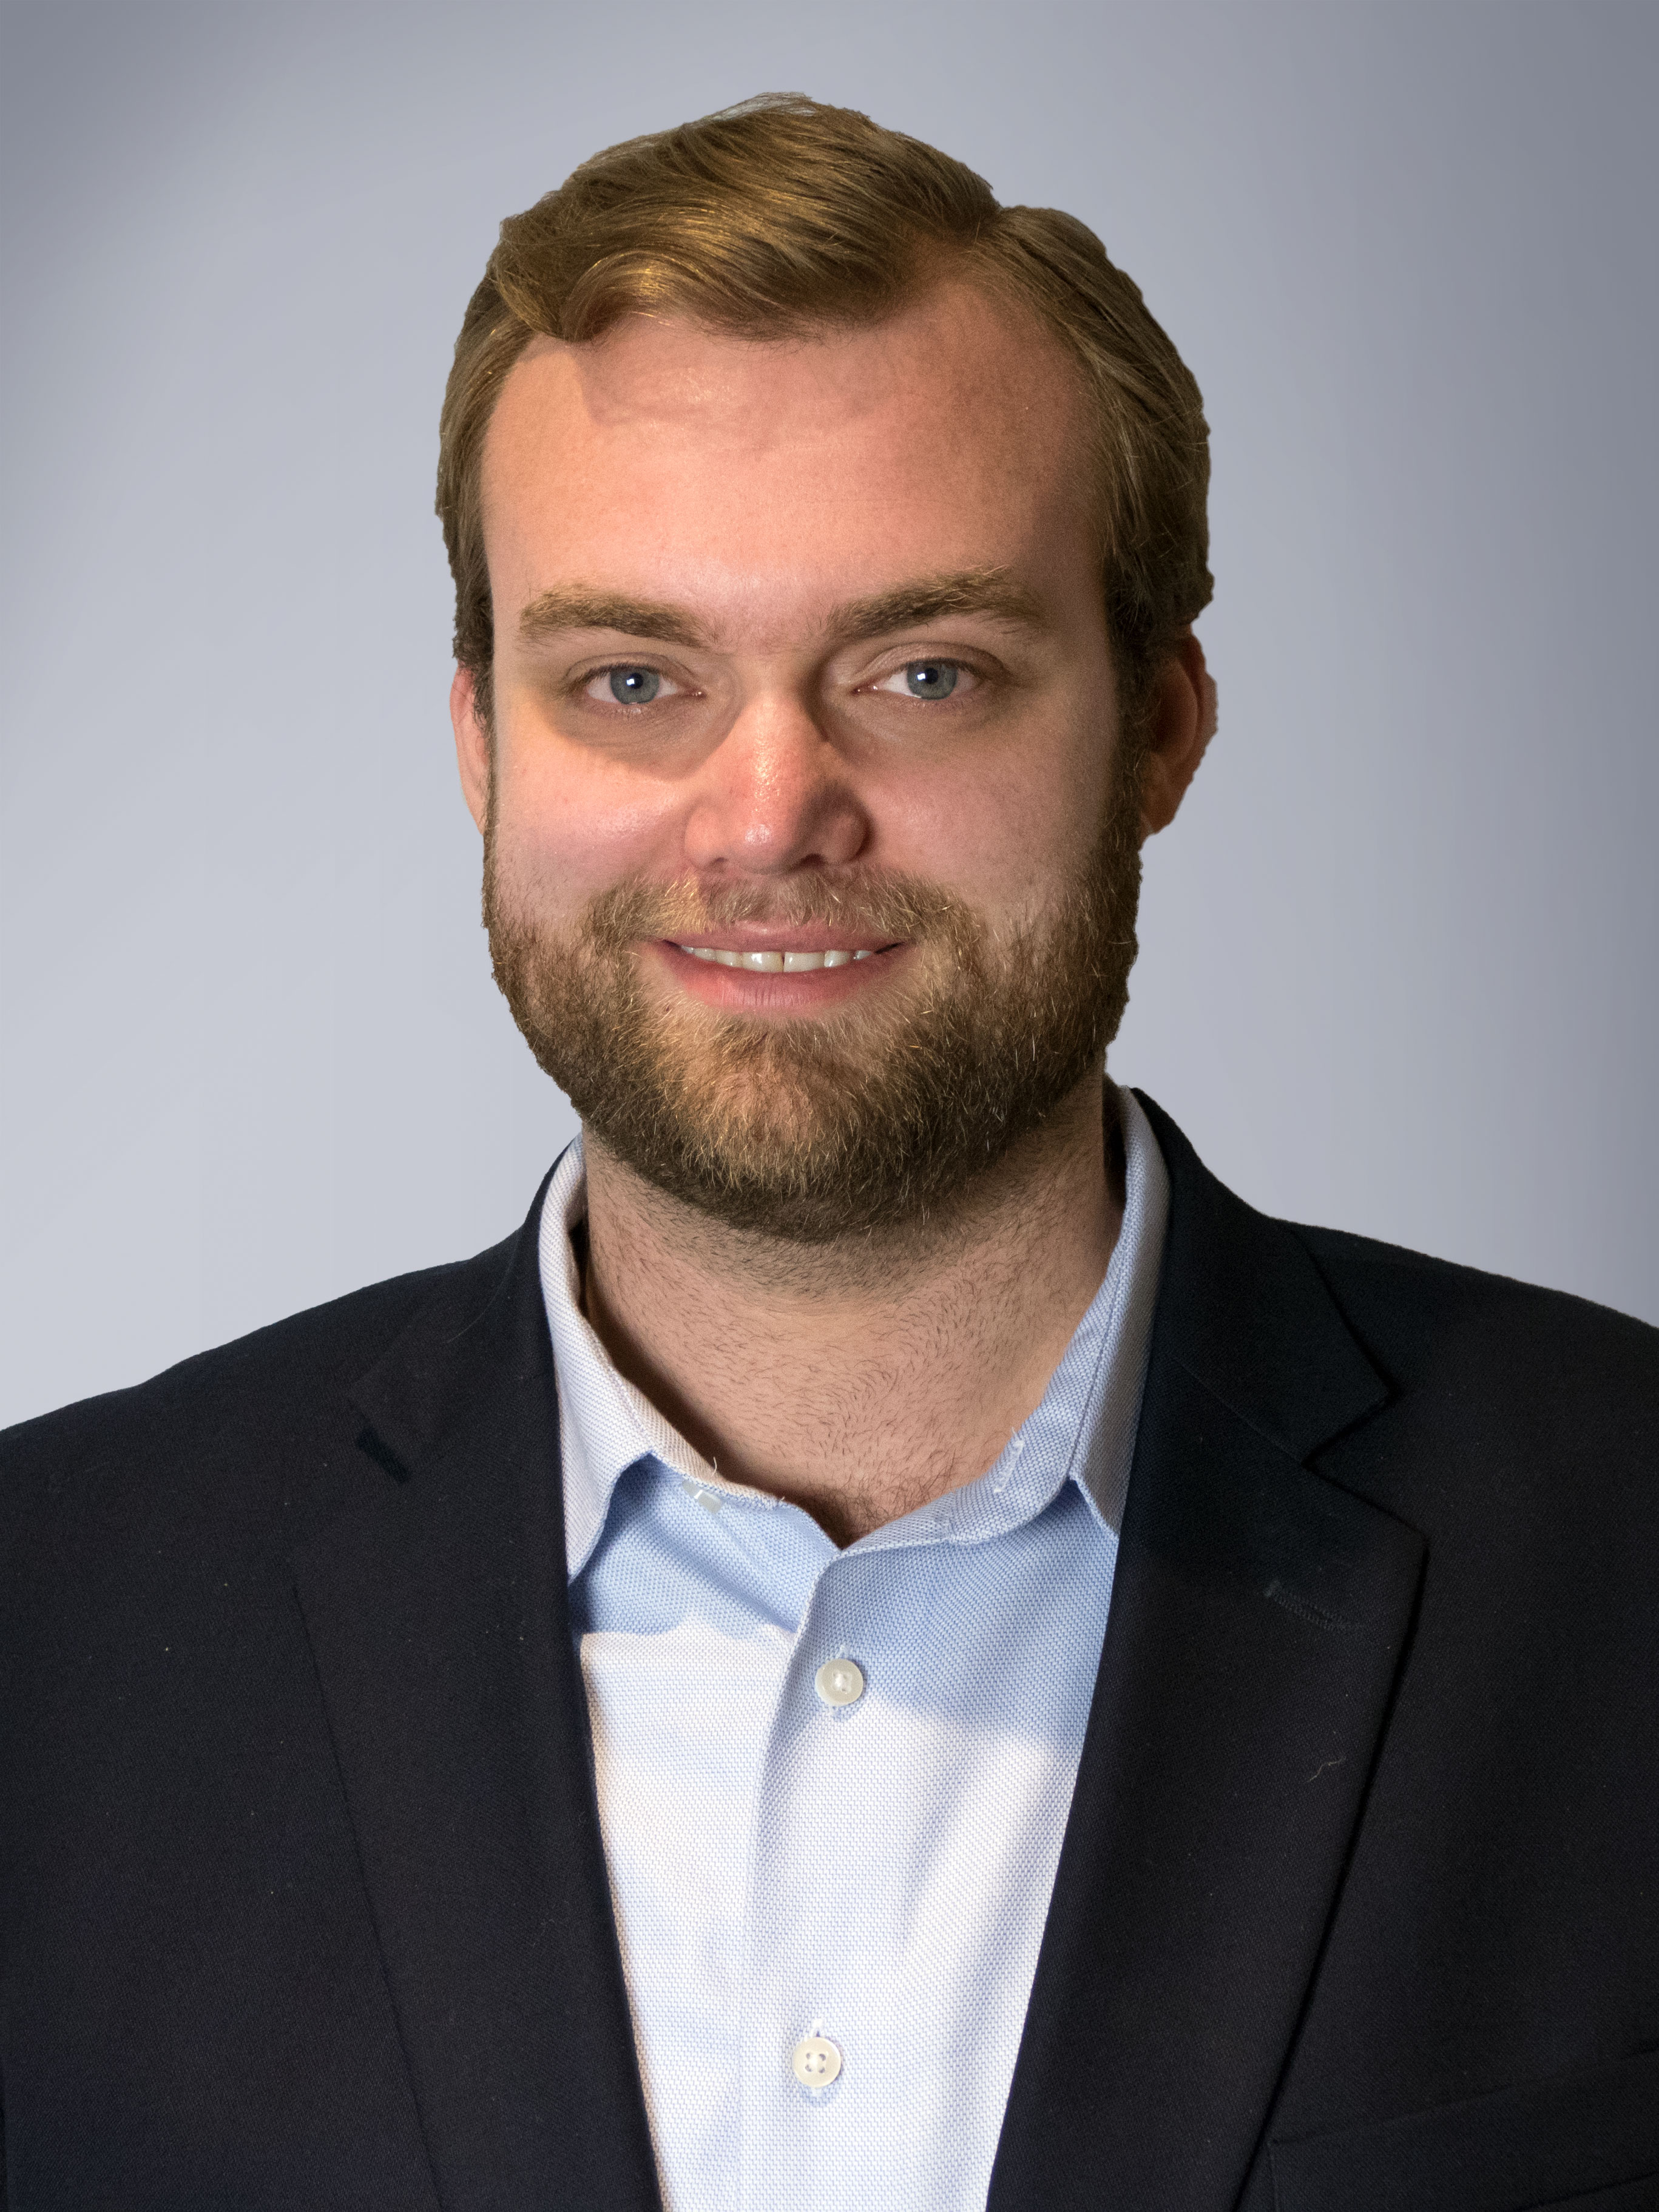 Michael Jaeggli